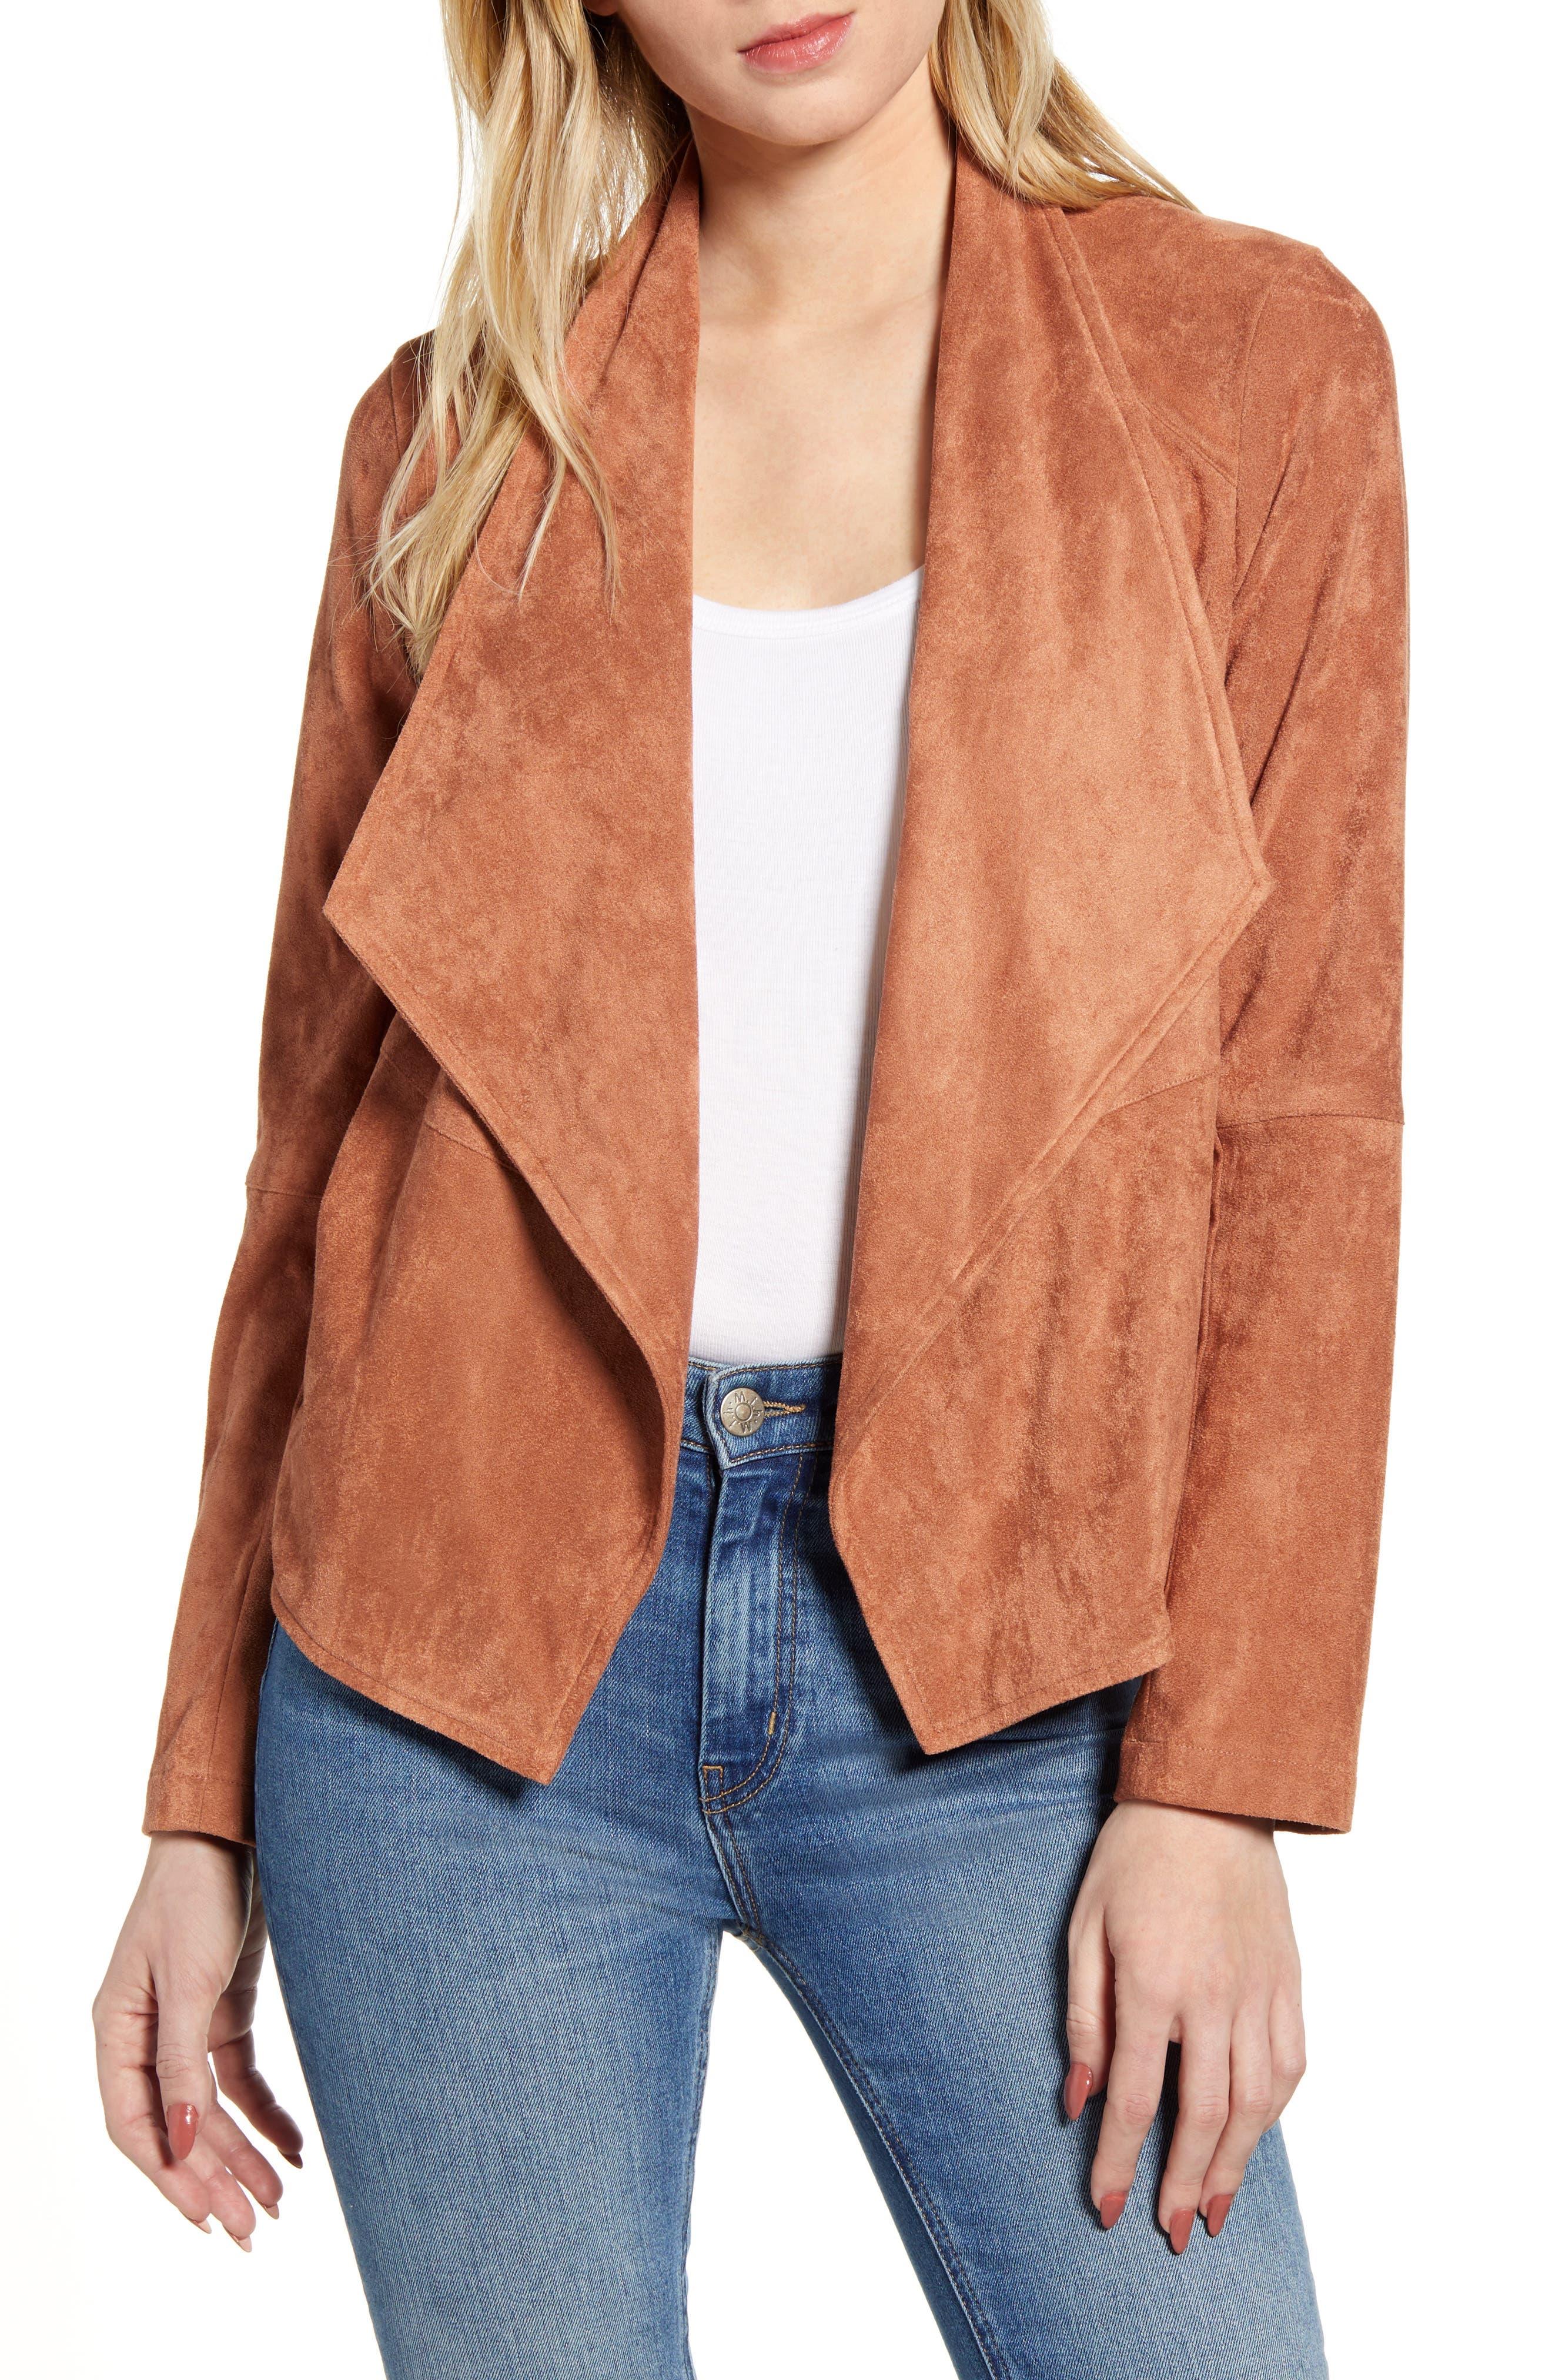 Rain Rose Cozy Modern Faux Suede Jacket